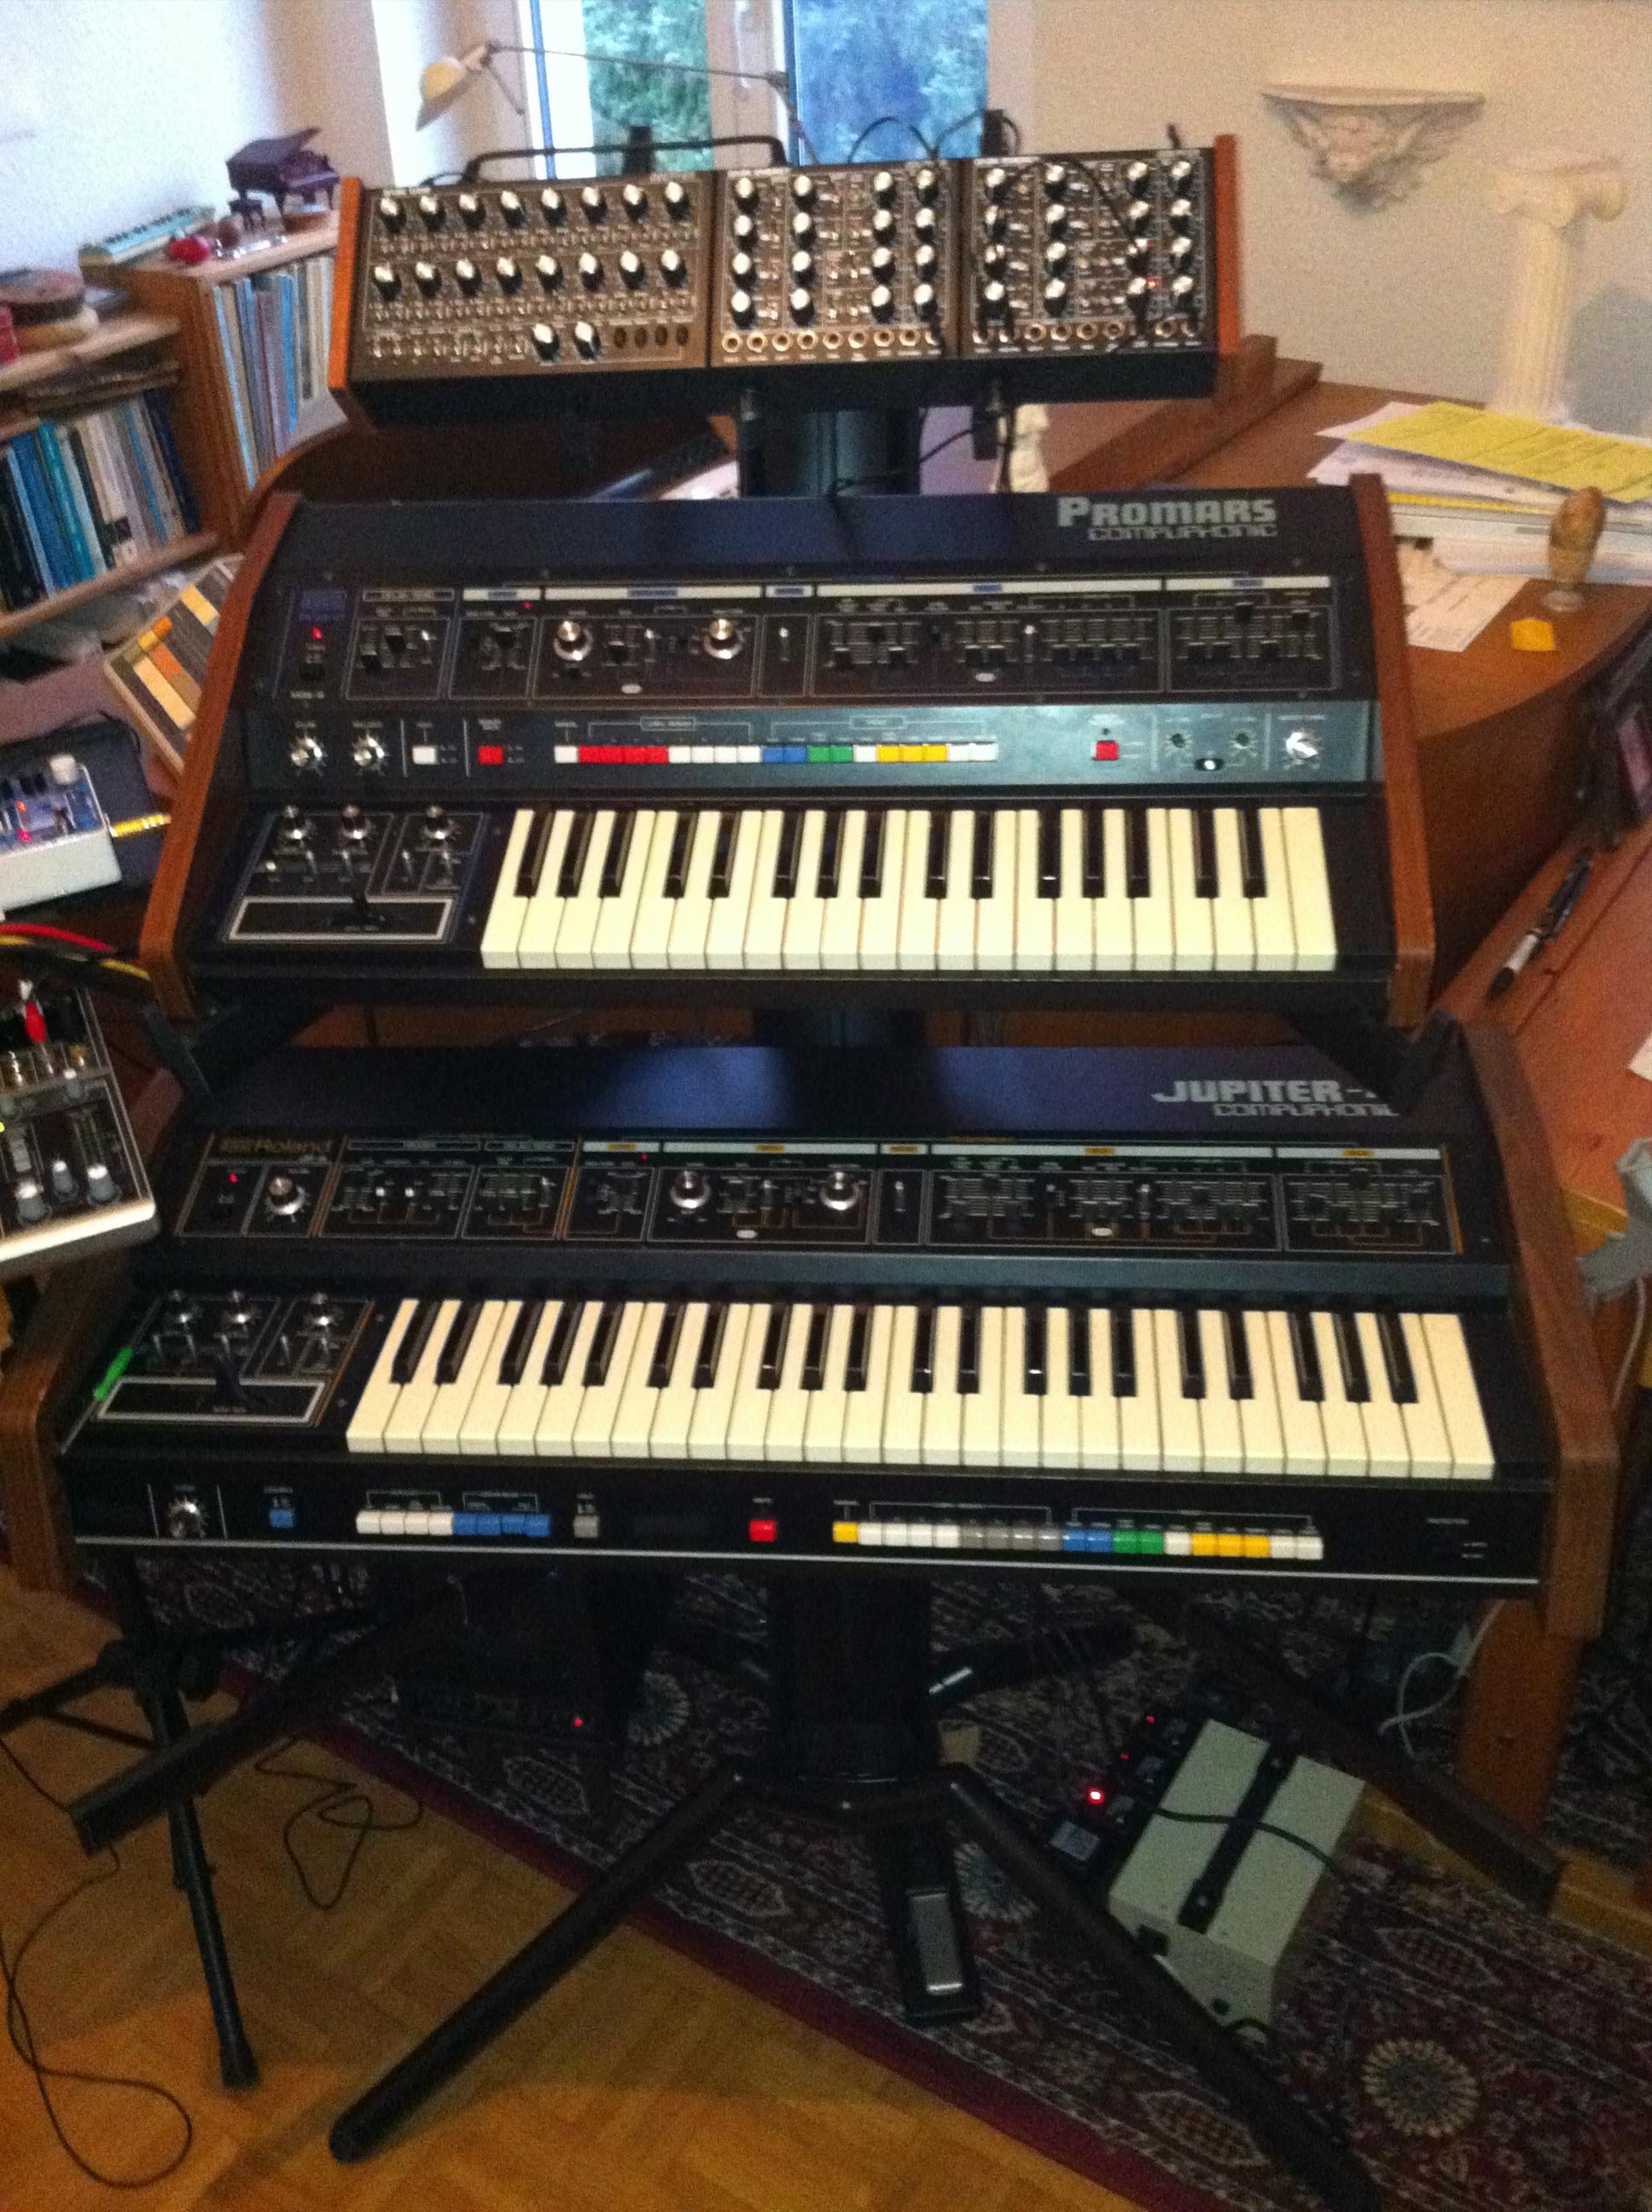 263443d1321545844-3-tier-keyboard-stand-small-footprint-img_0274.jpg